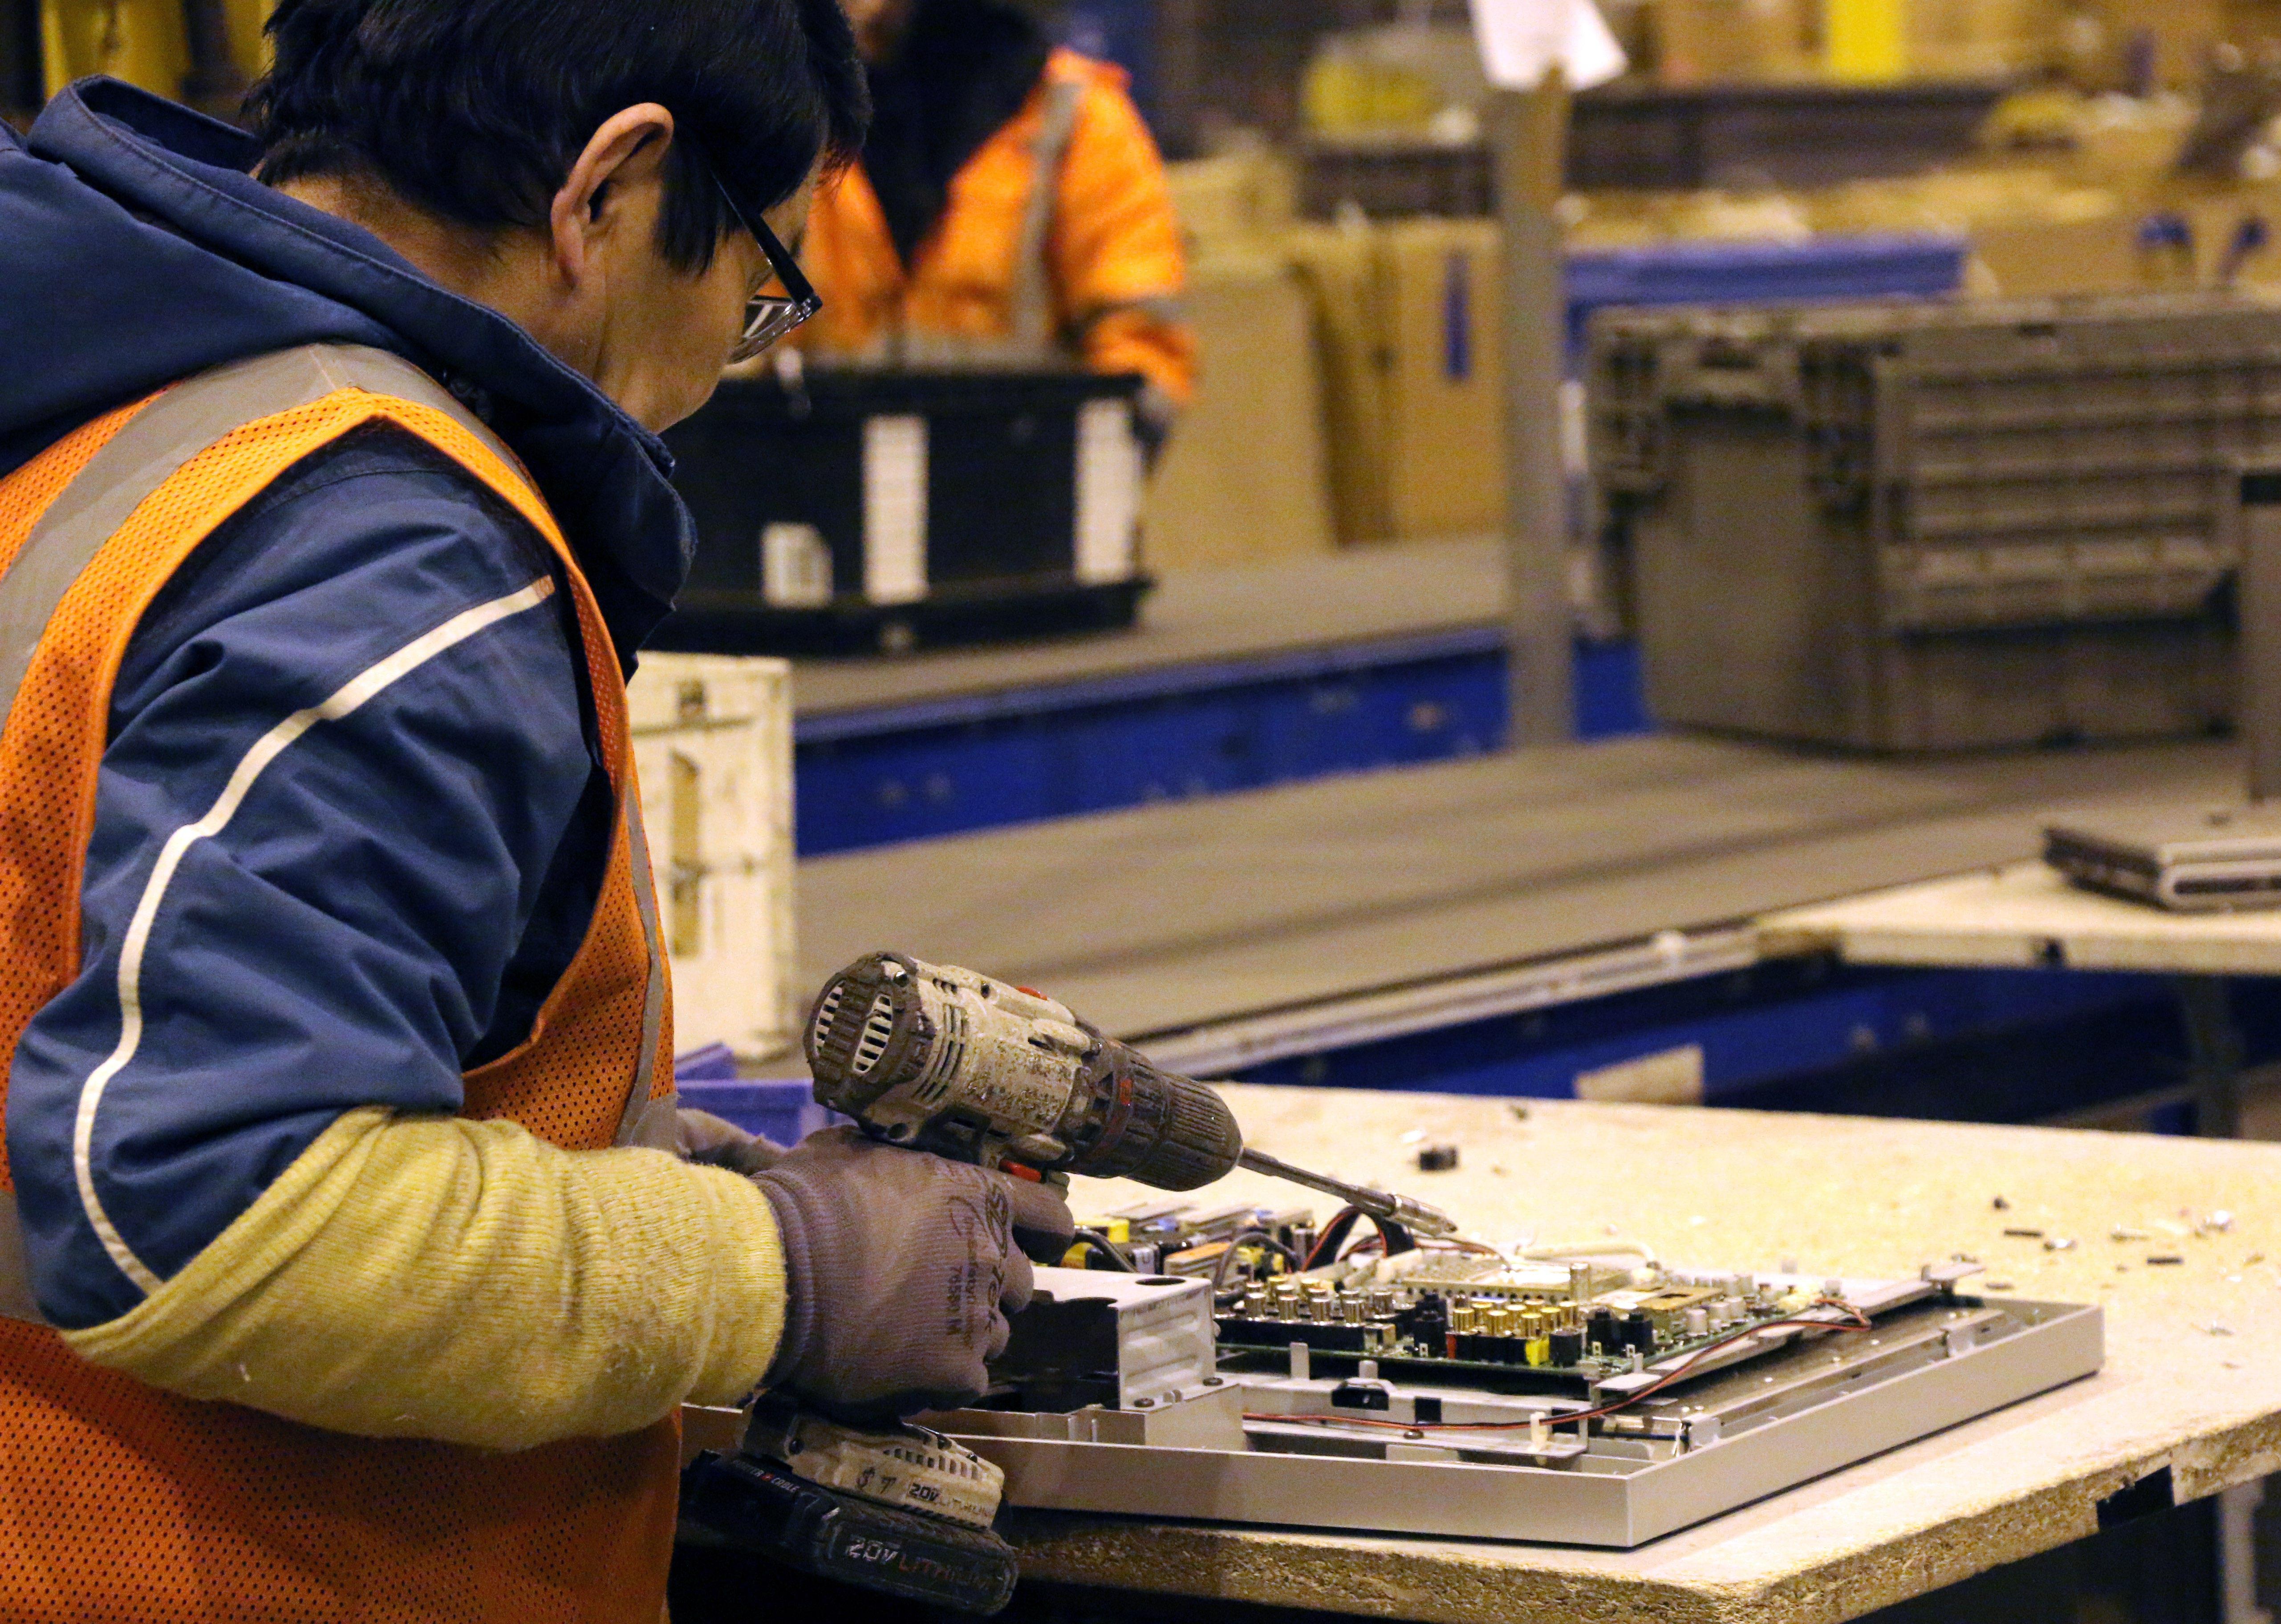 Sunnking Employee Dismantles Electronic Device